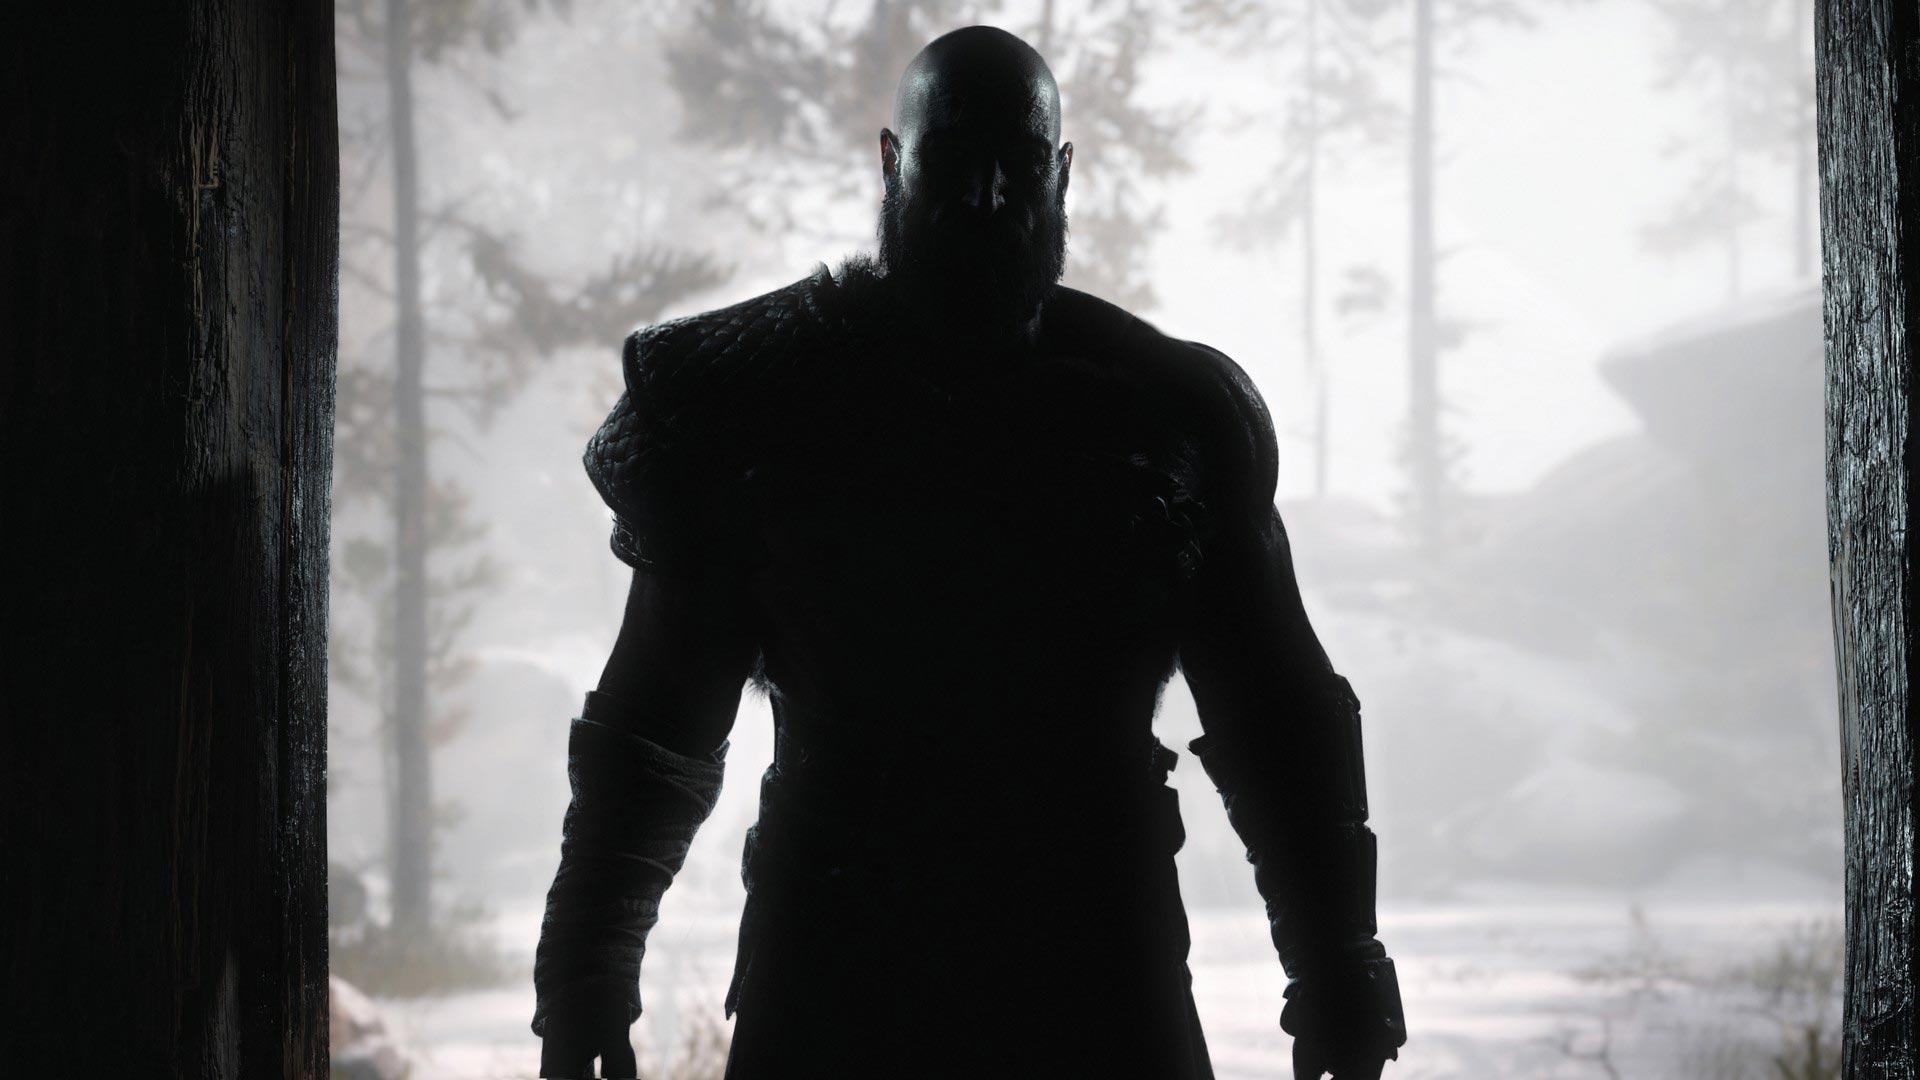 God of war Sequels announced